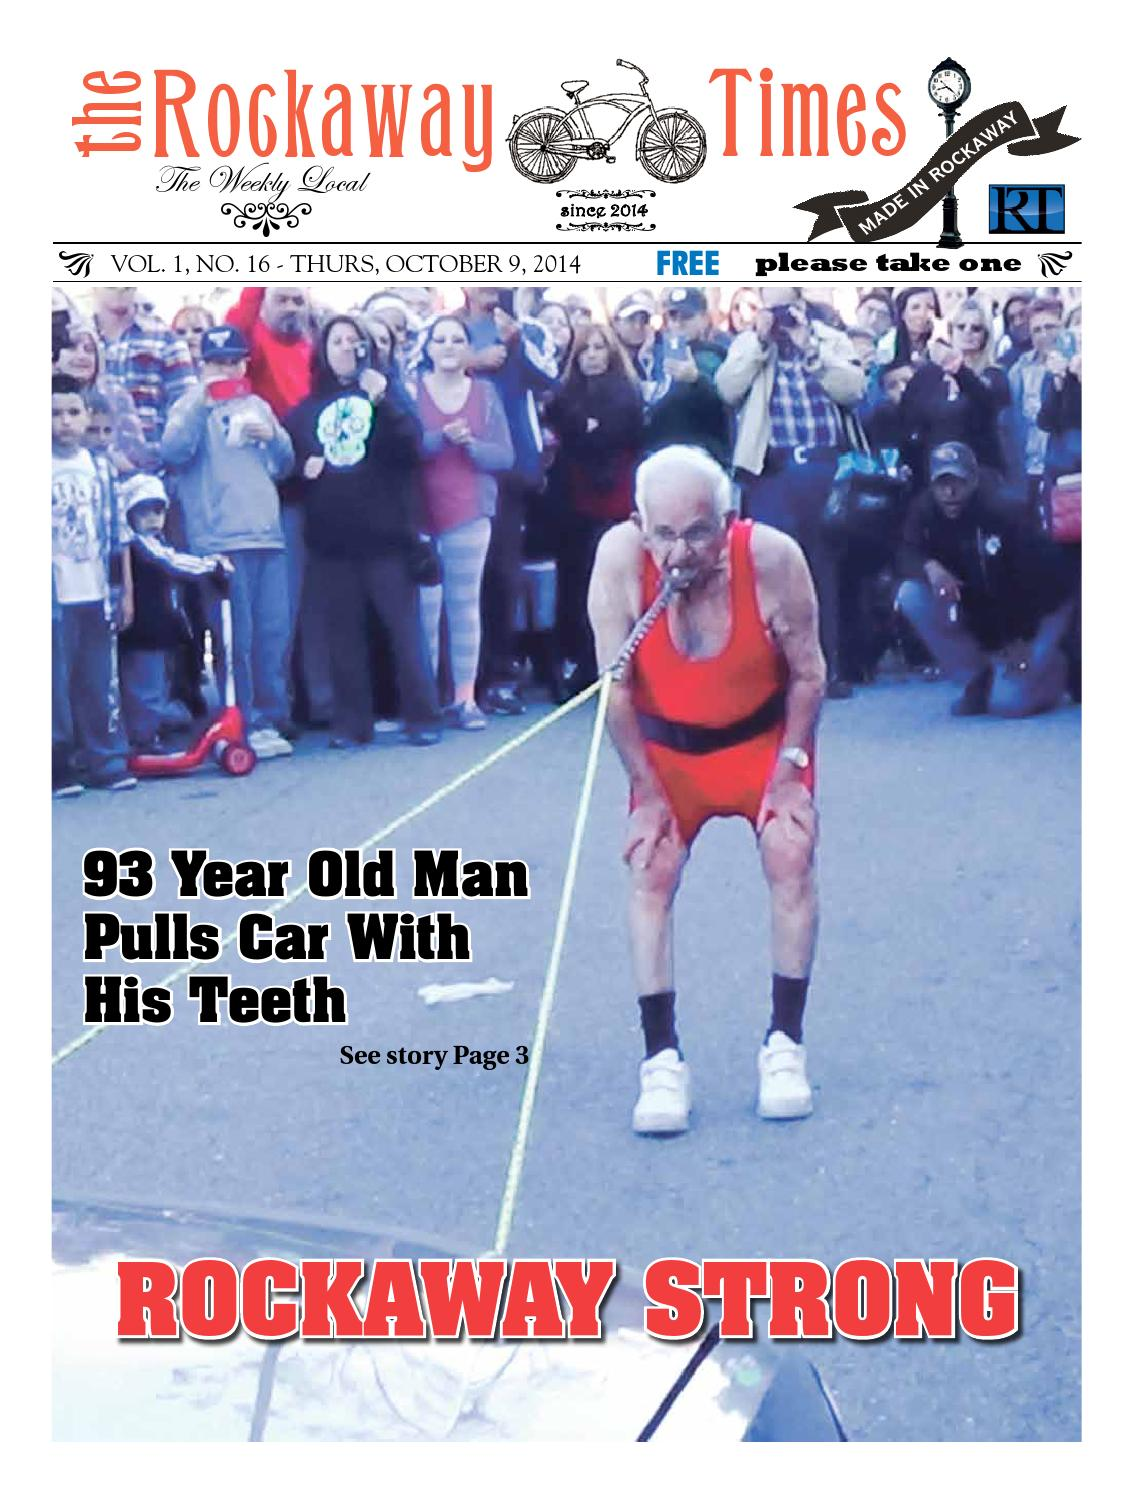 The Rockaway Times: Oct. 9, 2014 by Rockaway Times - issuu